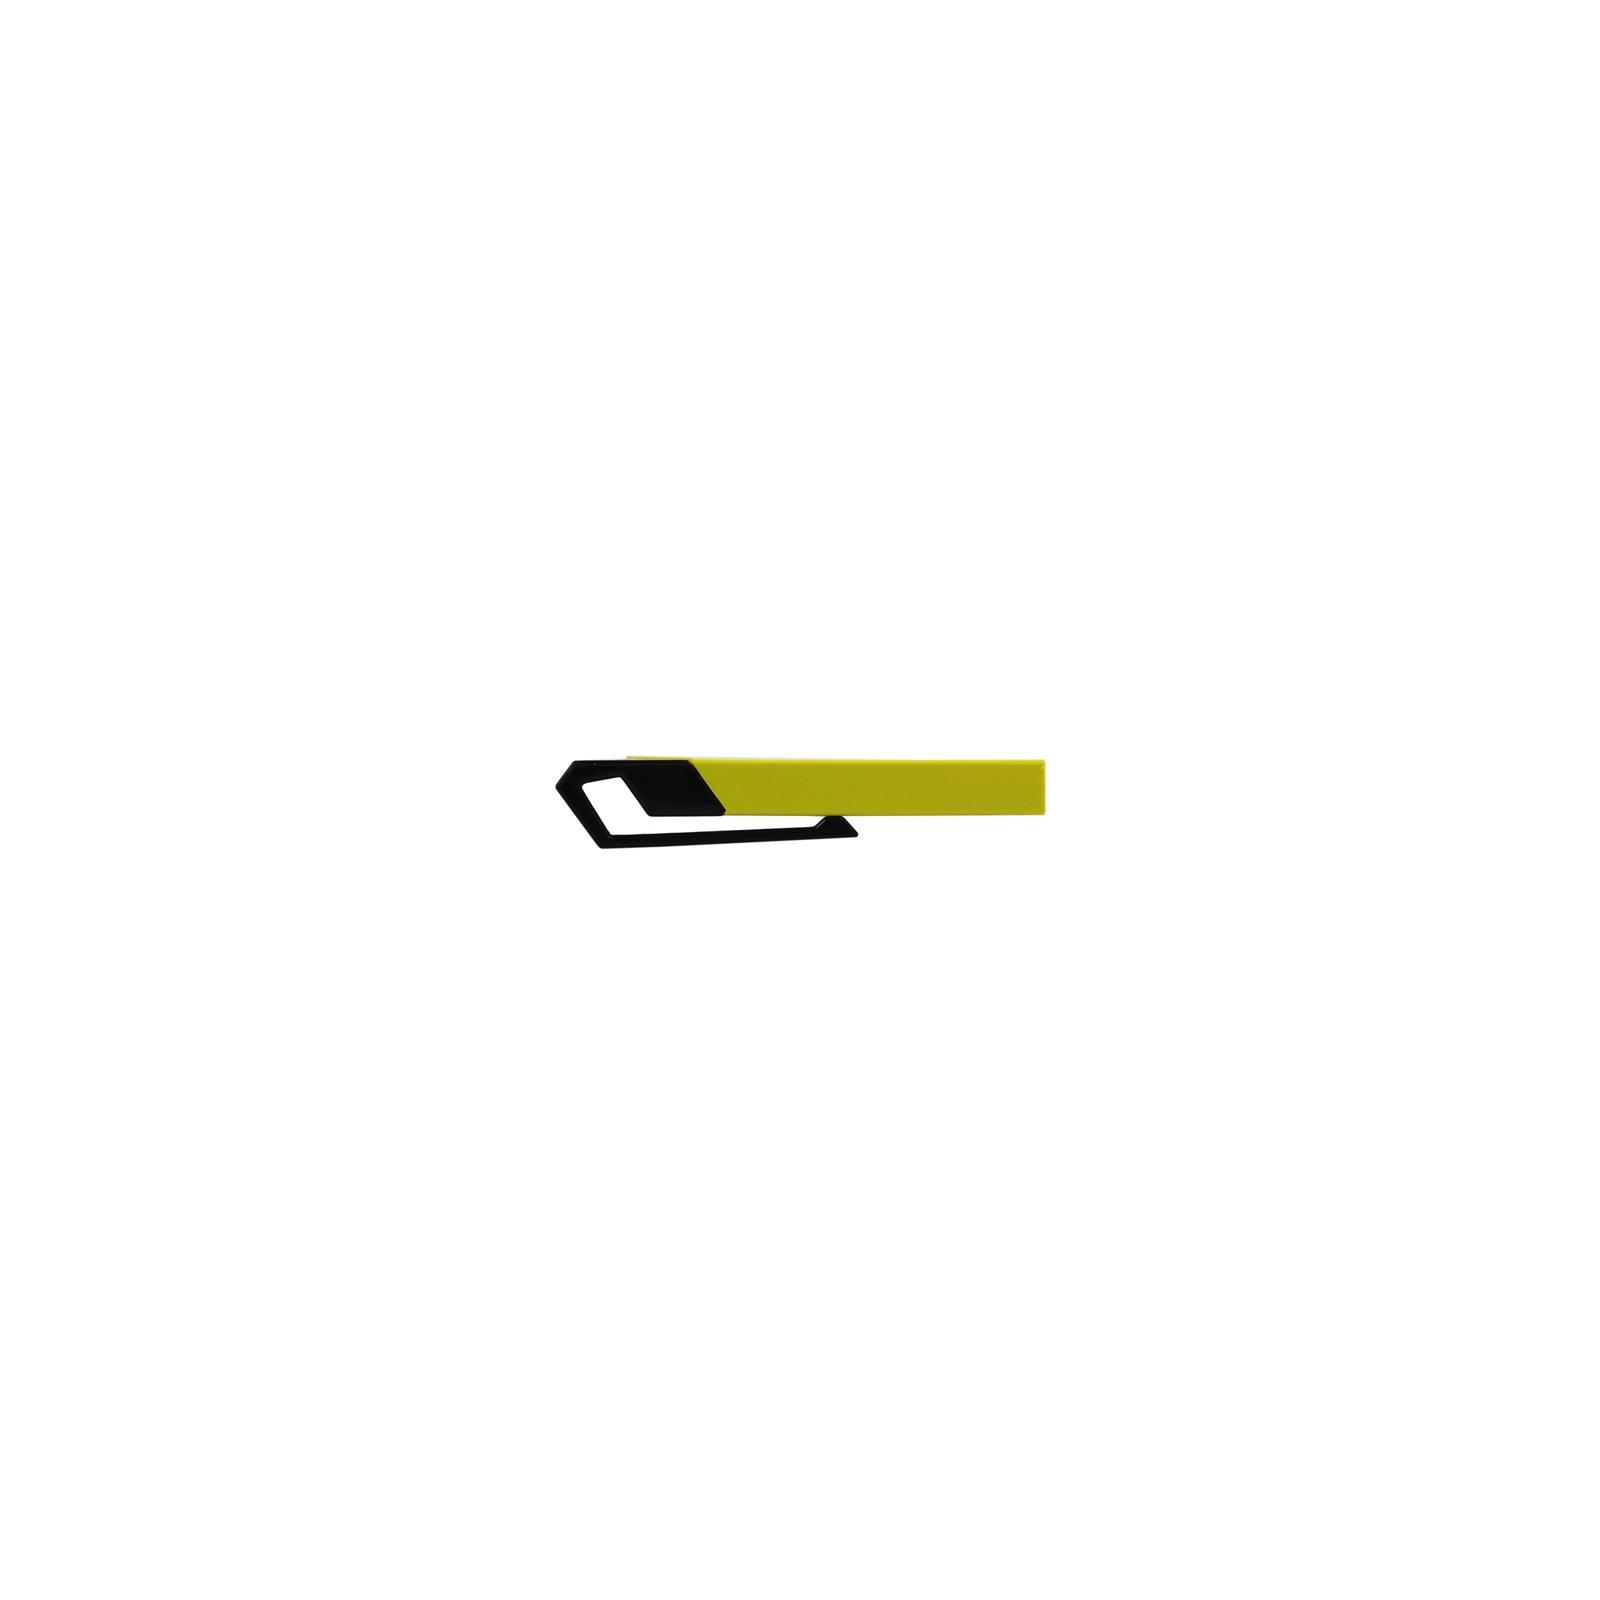 USB флеш накопитель 32GB AH131 Yellow RP USB2.0 Apacer (AP32GAH131Y-1) изображение 3